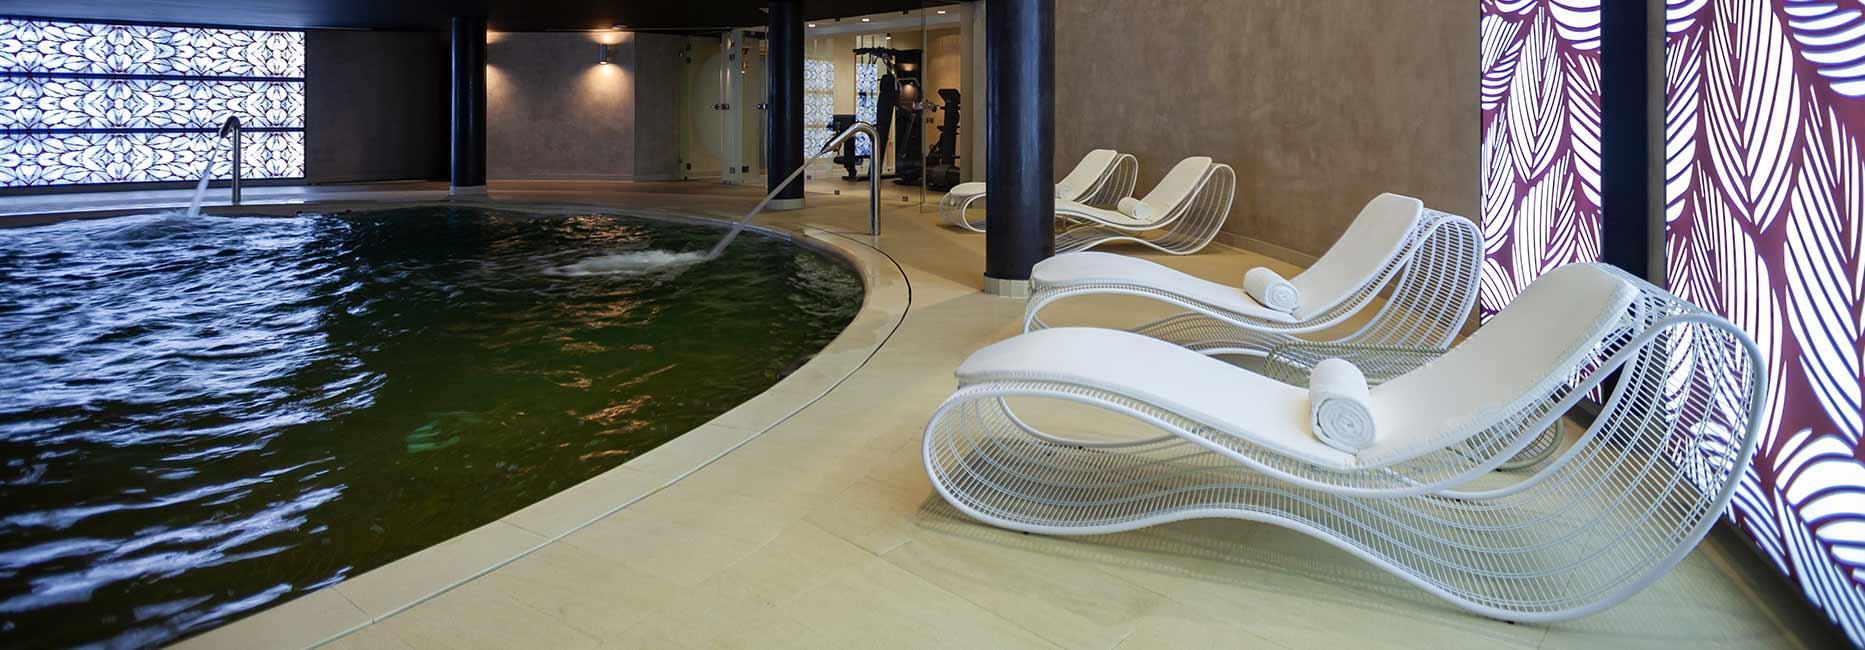 Indoor Pool at Avani Les Berges du Lac Tunis Suites